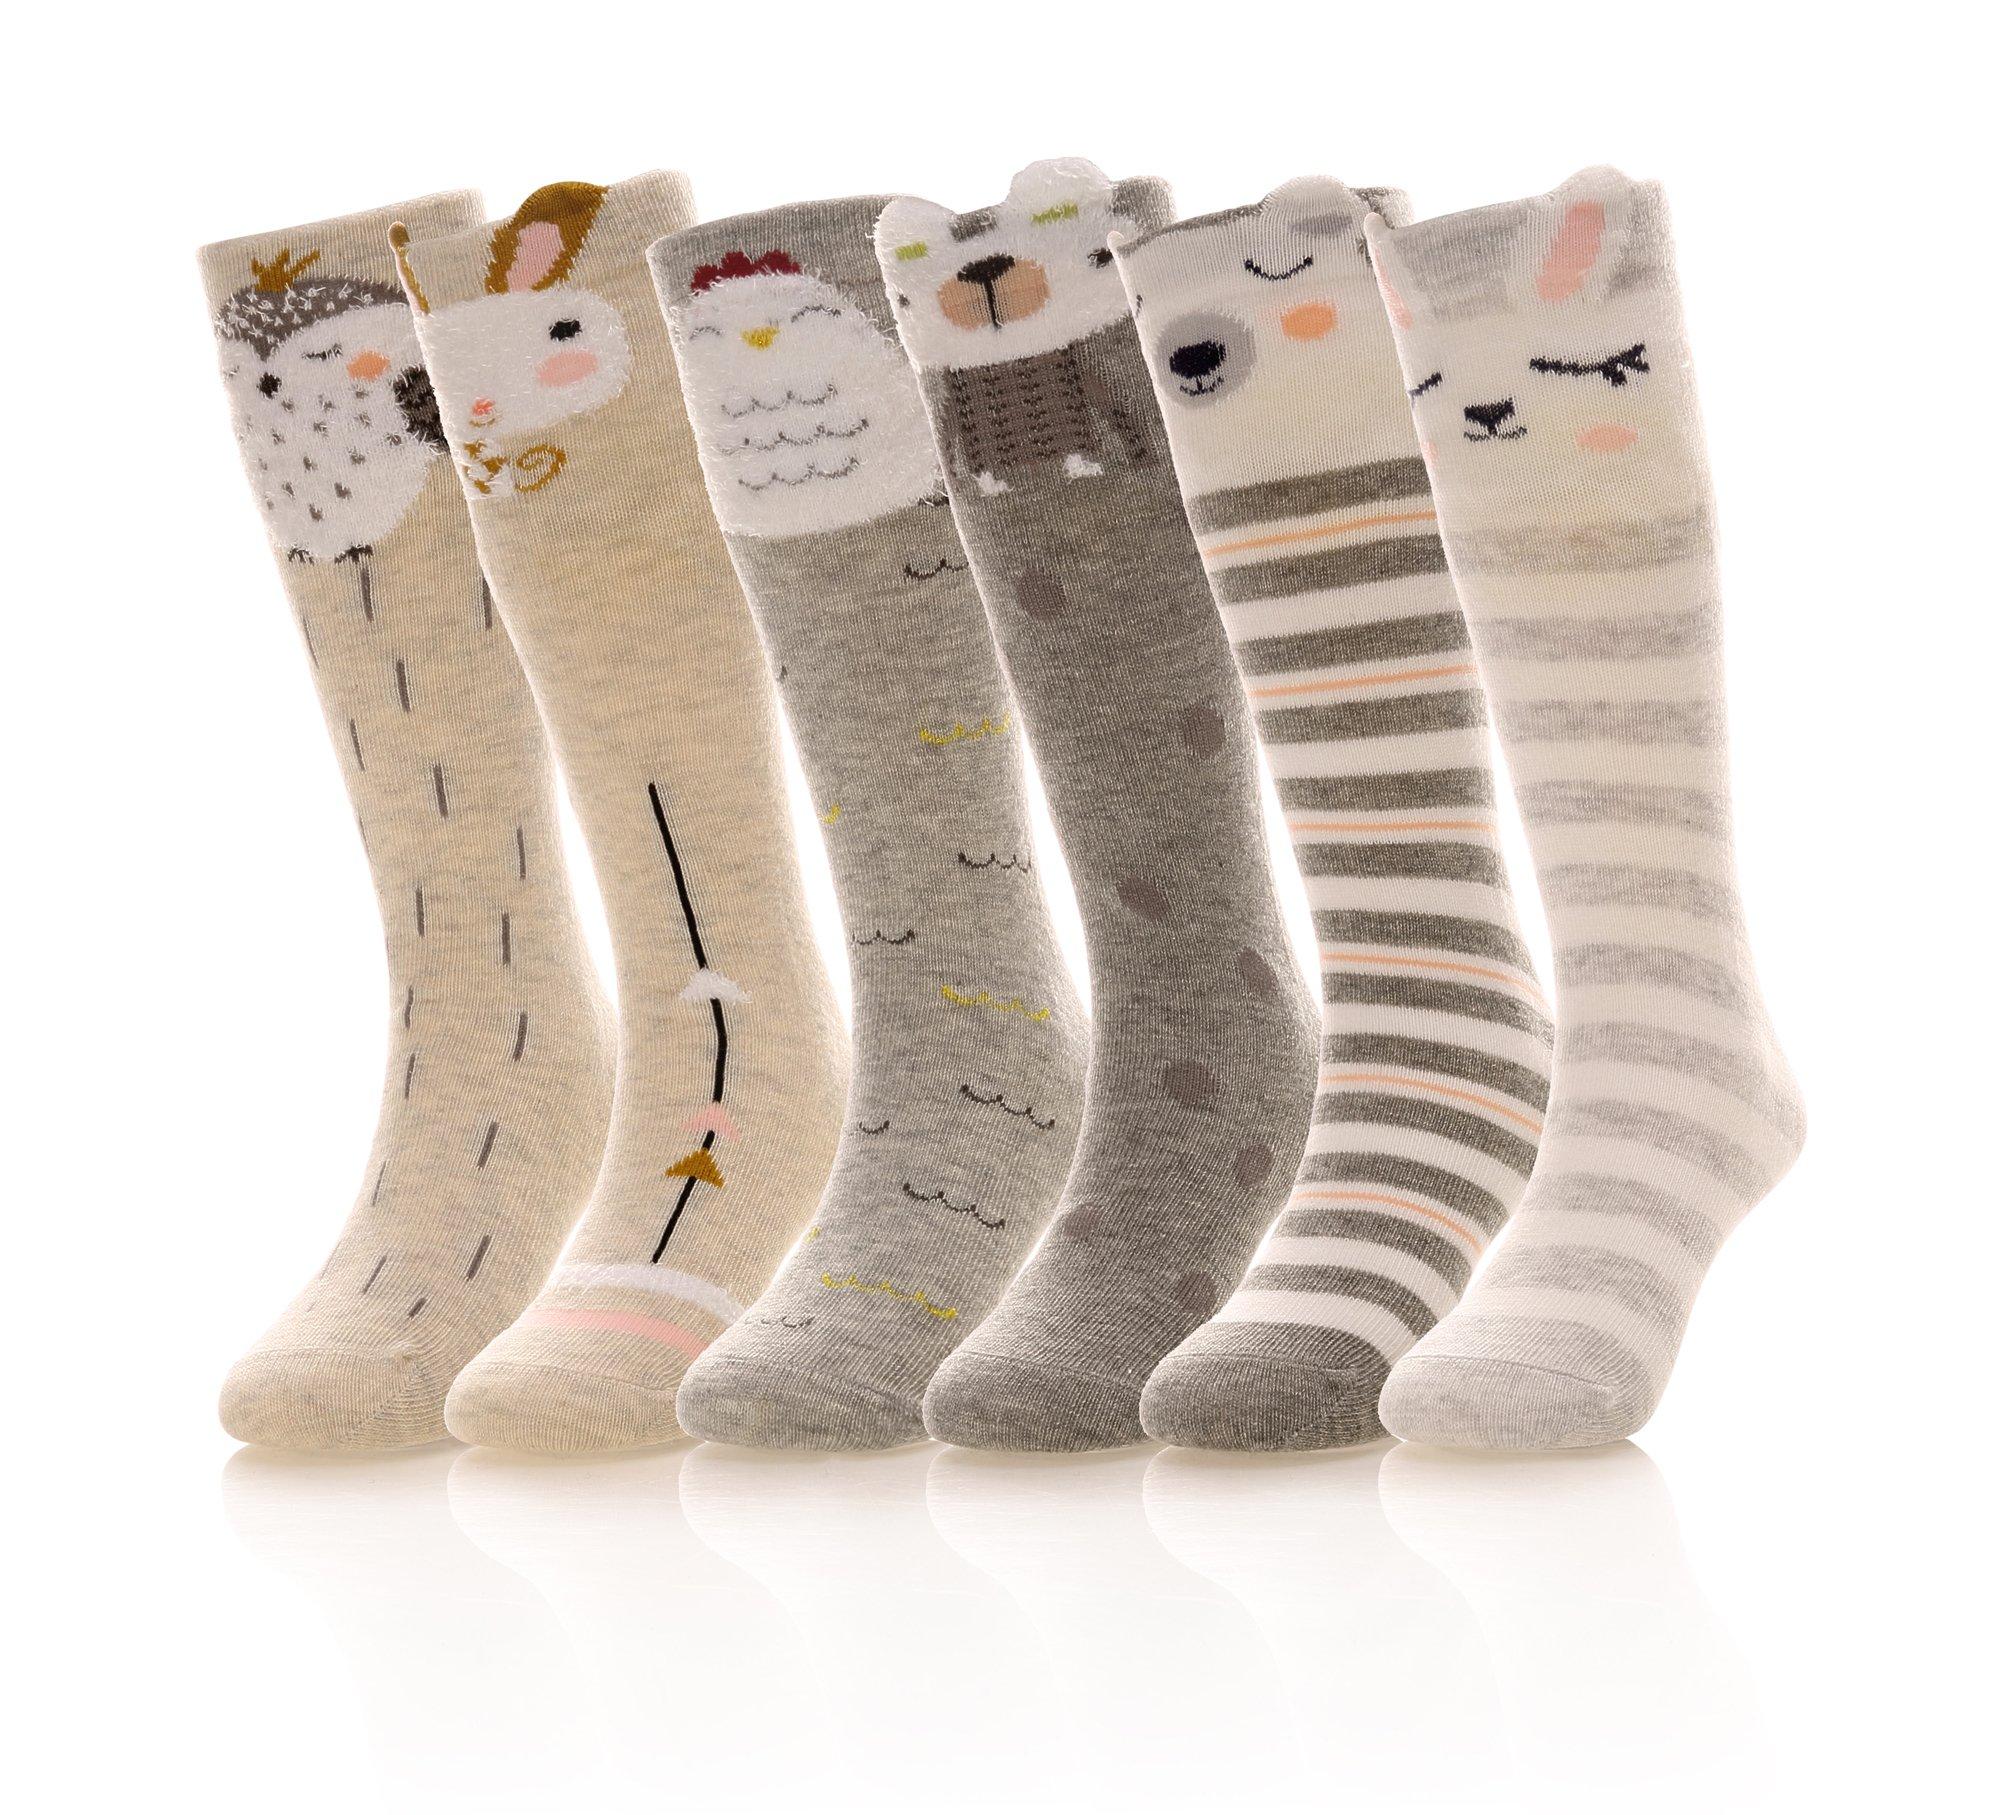 Eocom Girls Socks Knee High Stockings Animal Warm Cotton Socks (6 Pairs)